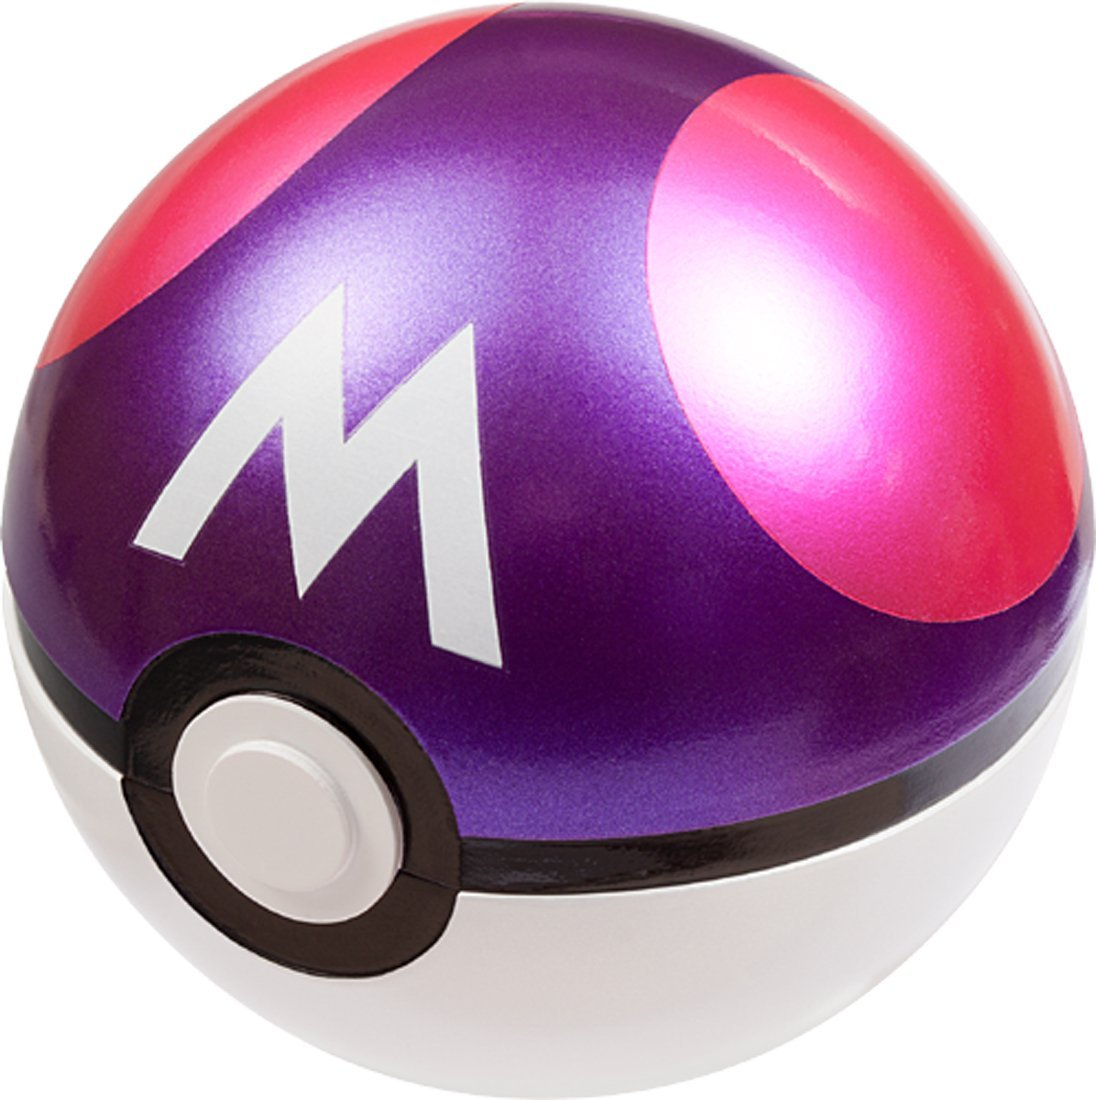 Masterball ของแท้ JP - Takara Tomy Moncolle [โมเดลโปเกบอล]